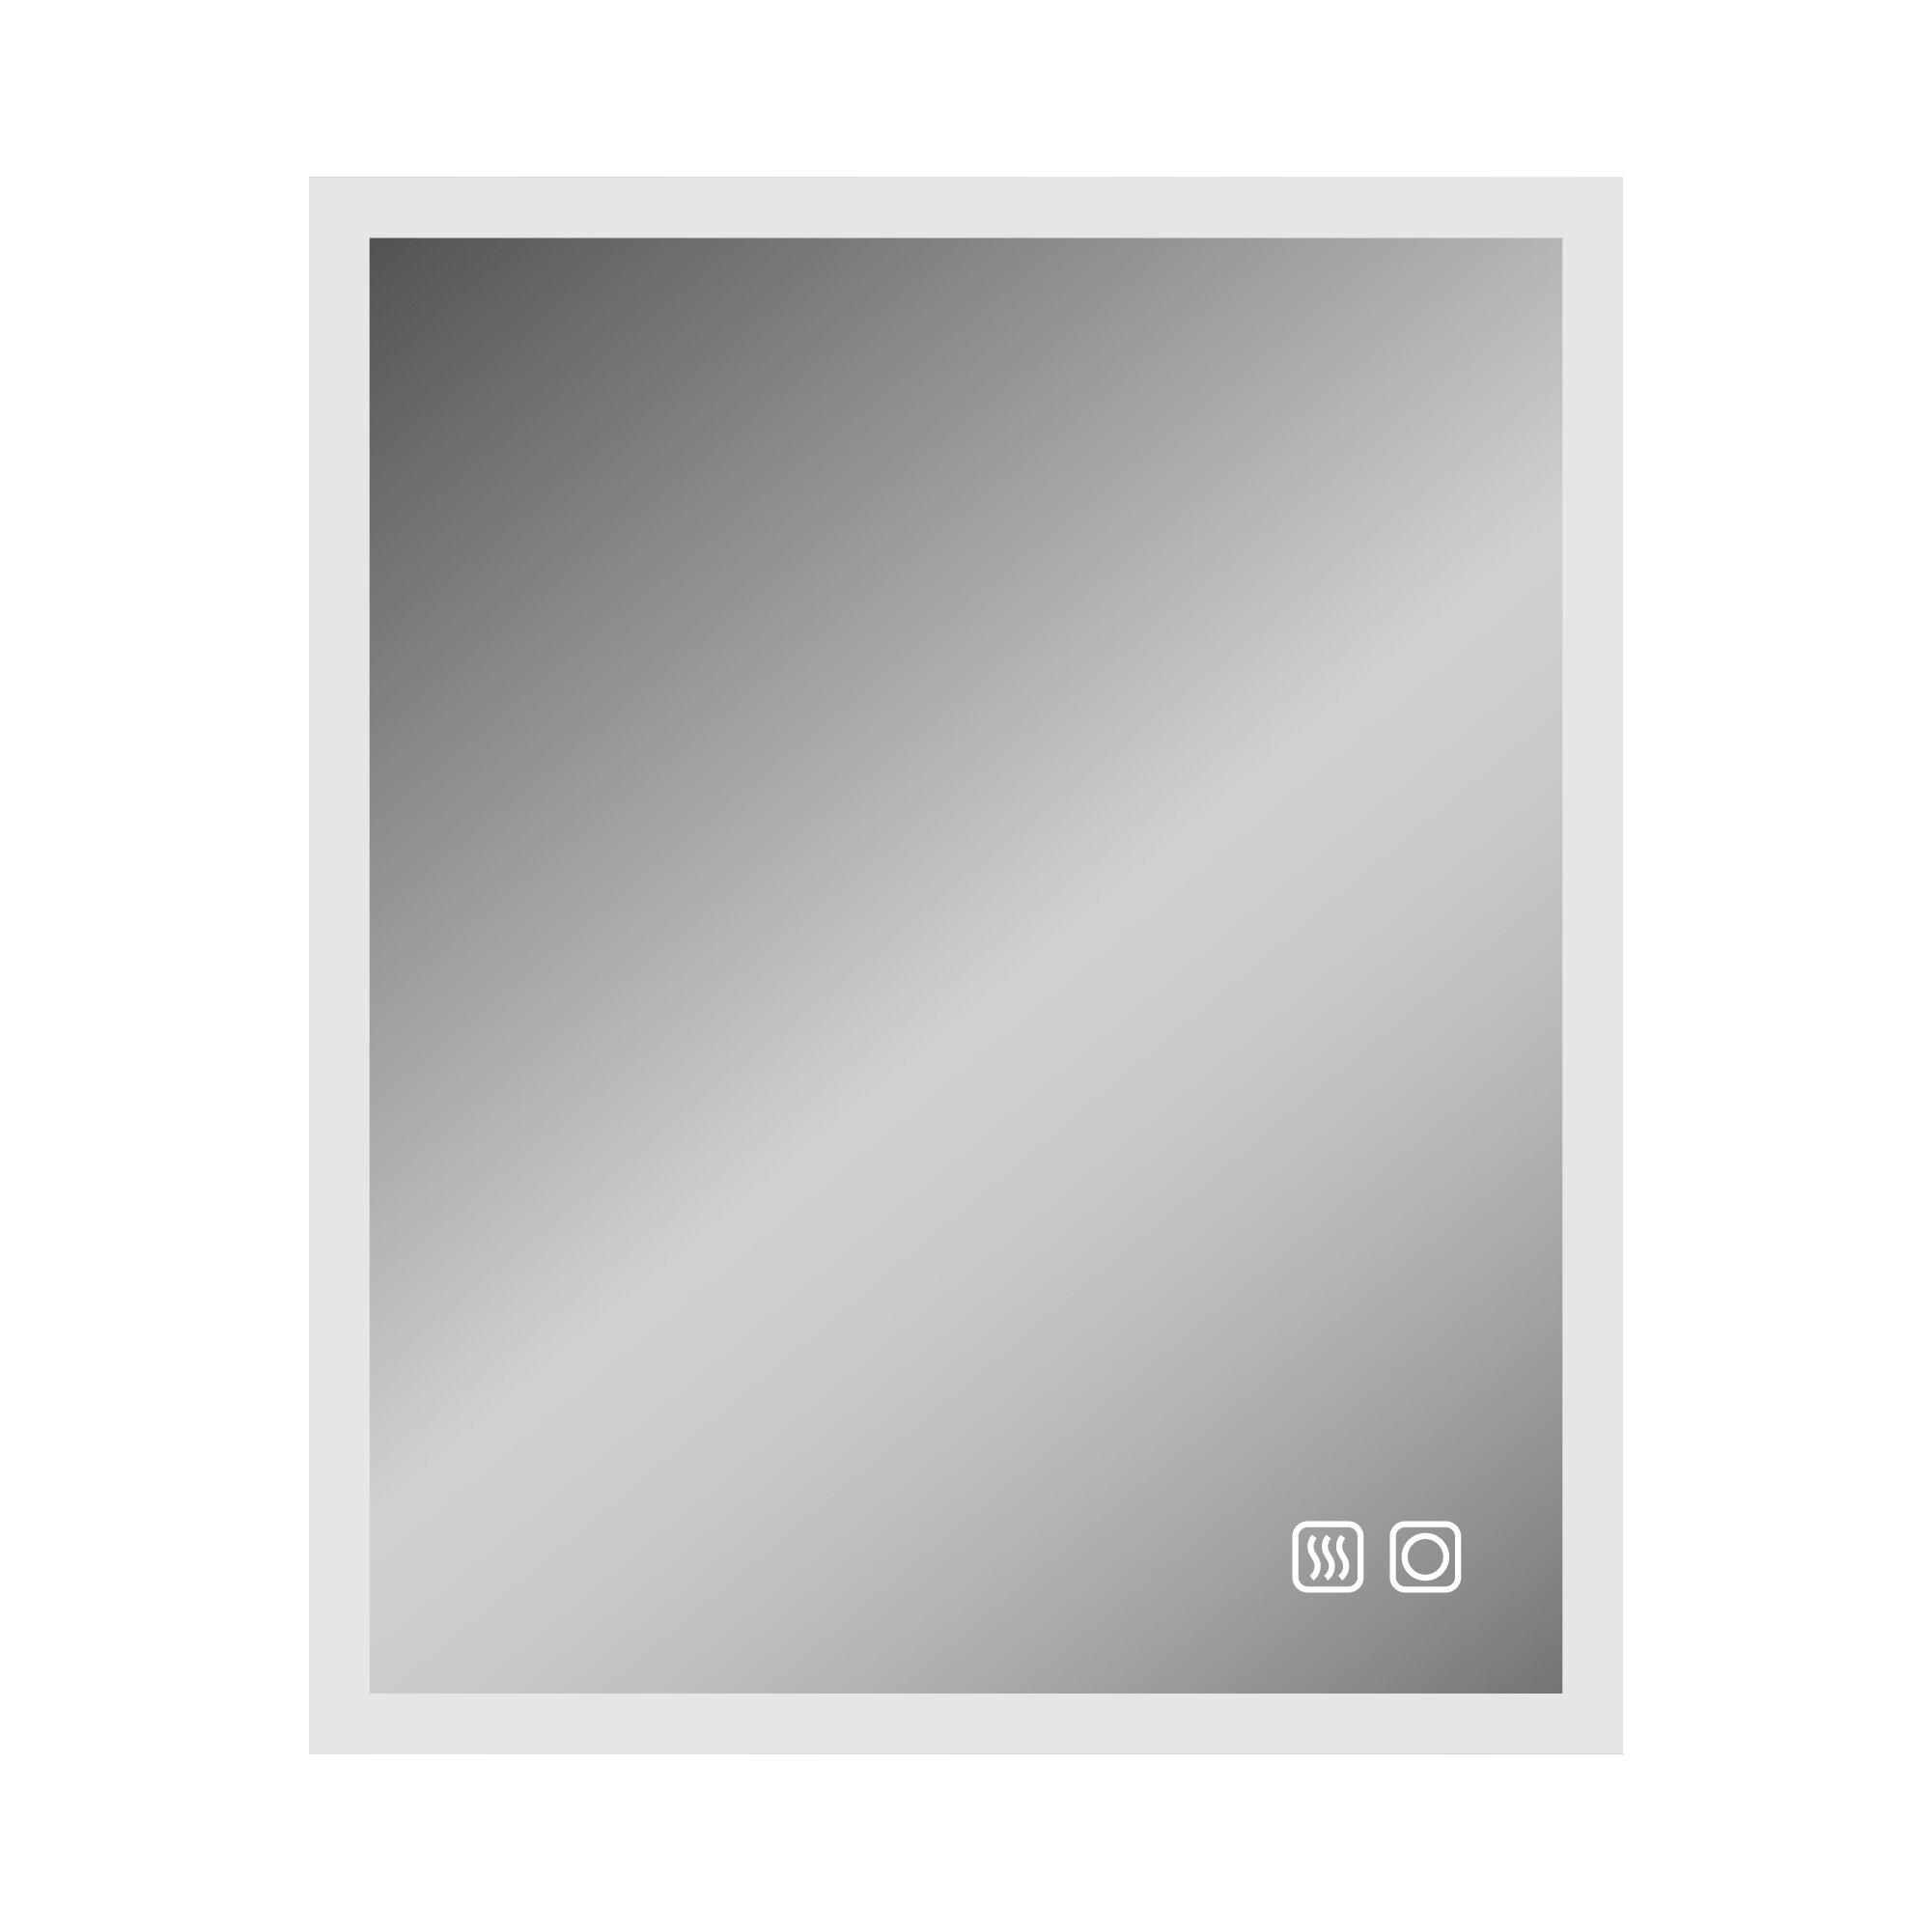 Boyel Living Led Aesthetic Lighted Bathroom Vanity Mirror Wayfair